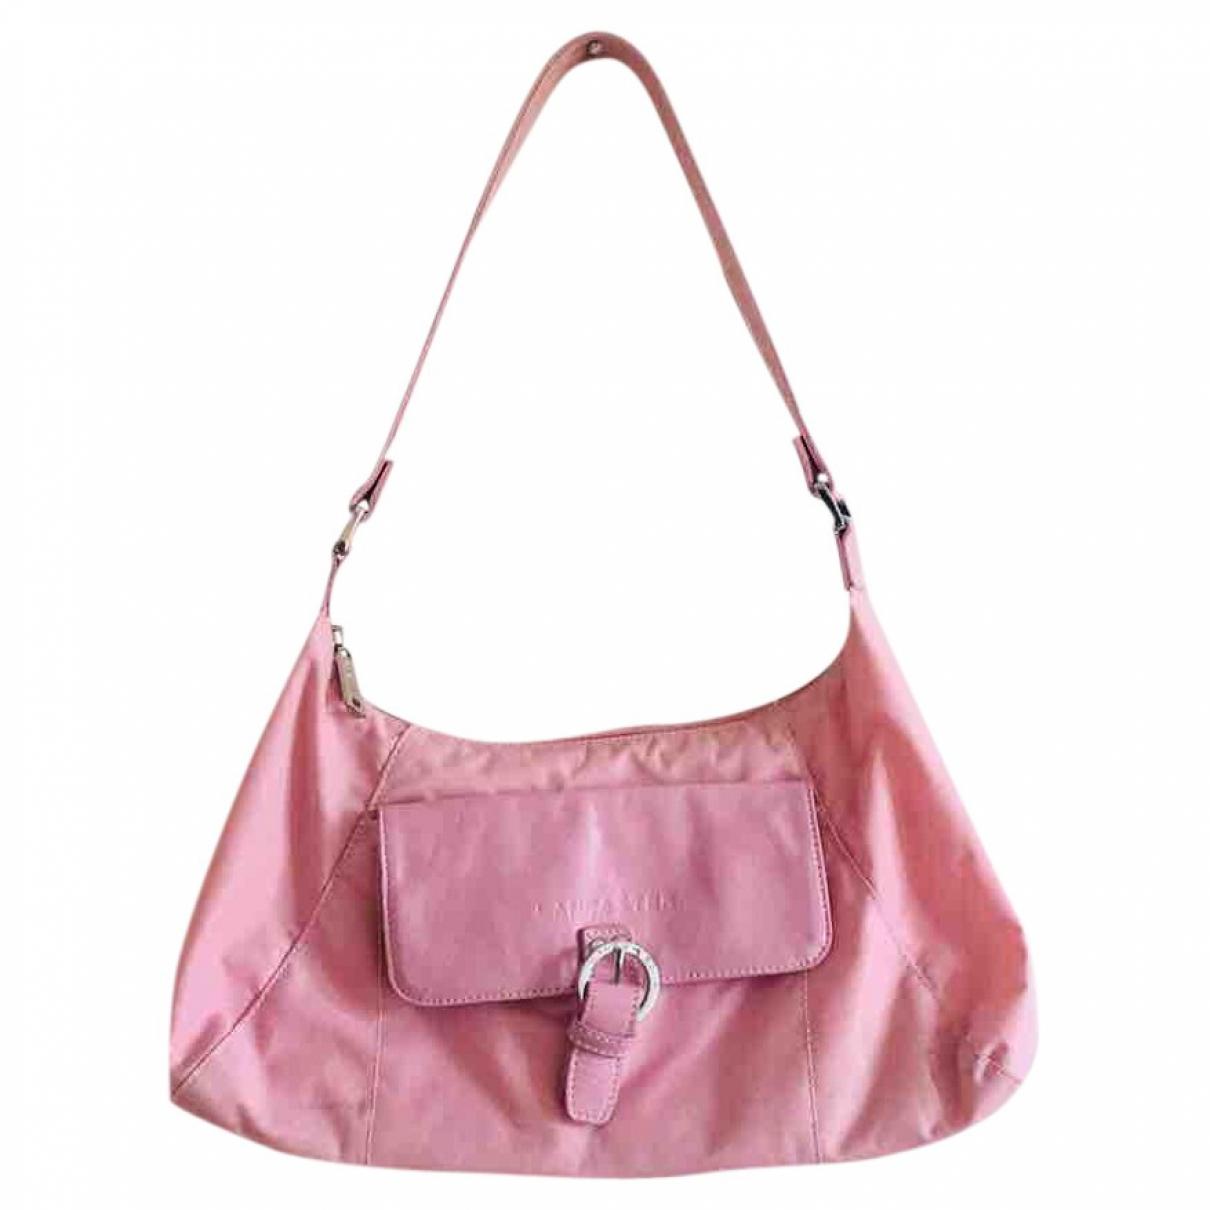 Lancaster \N Handtasche in  Rosa Leinen